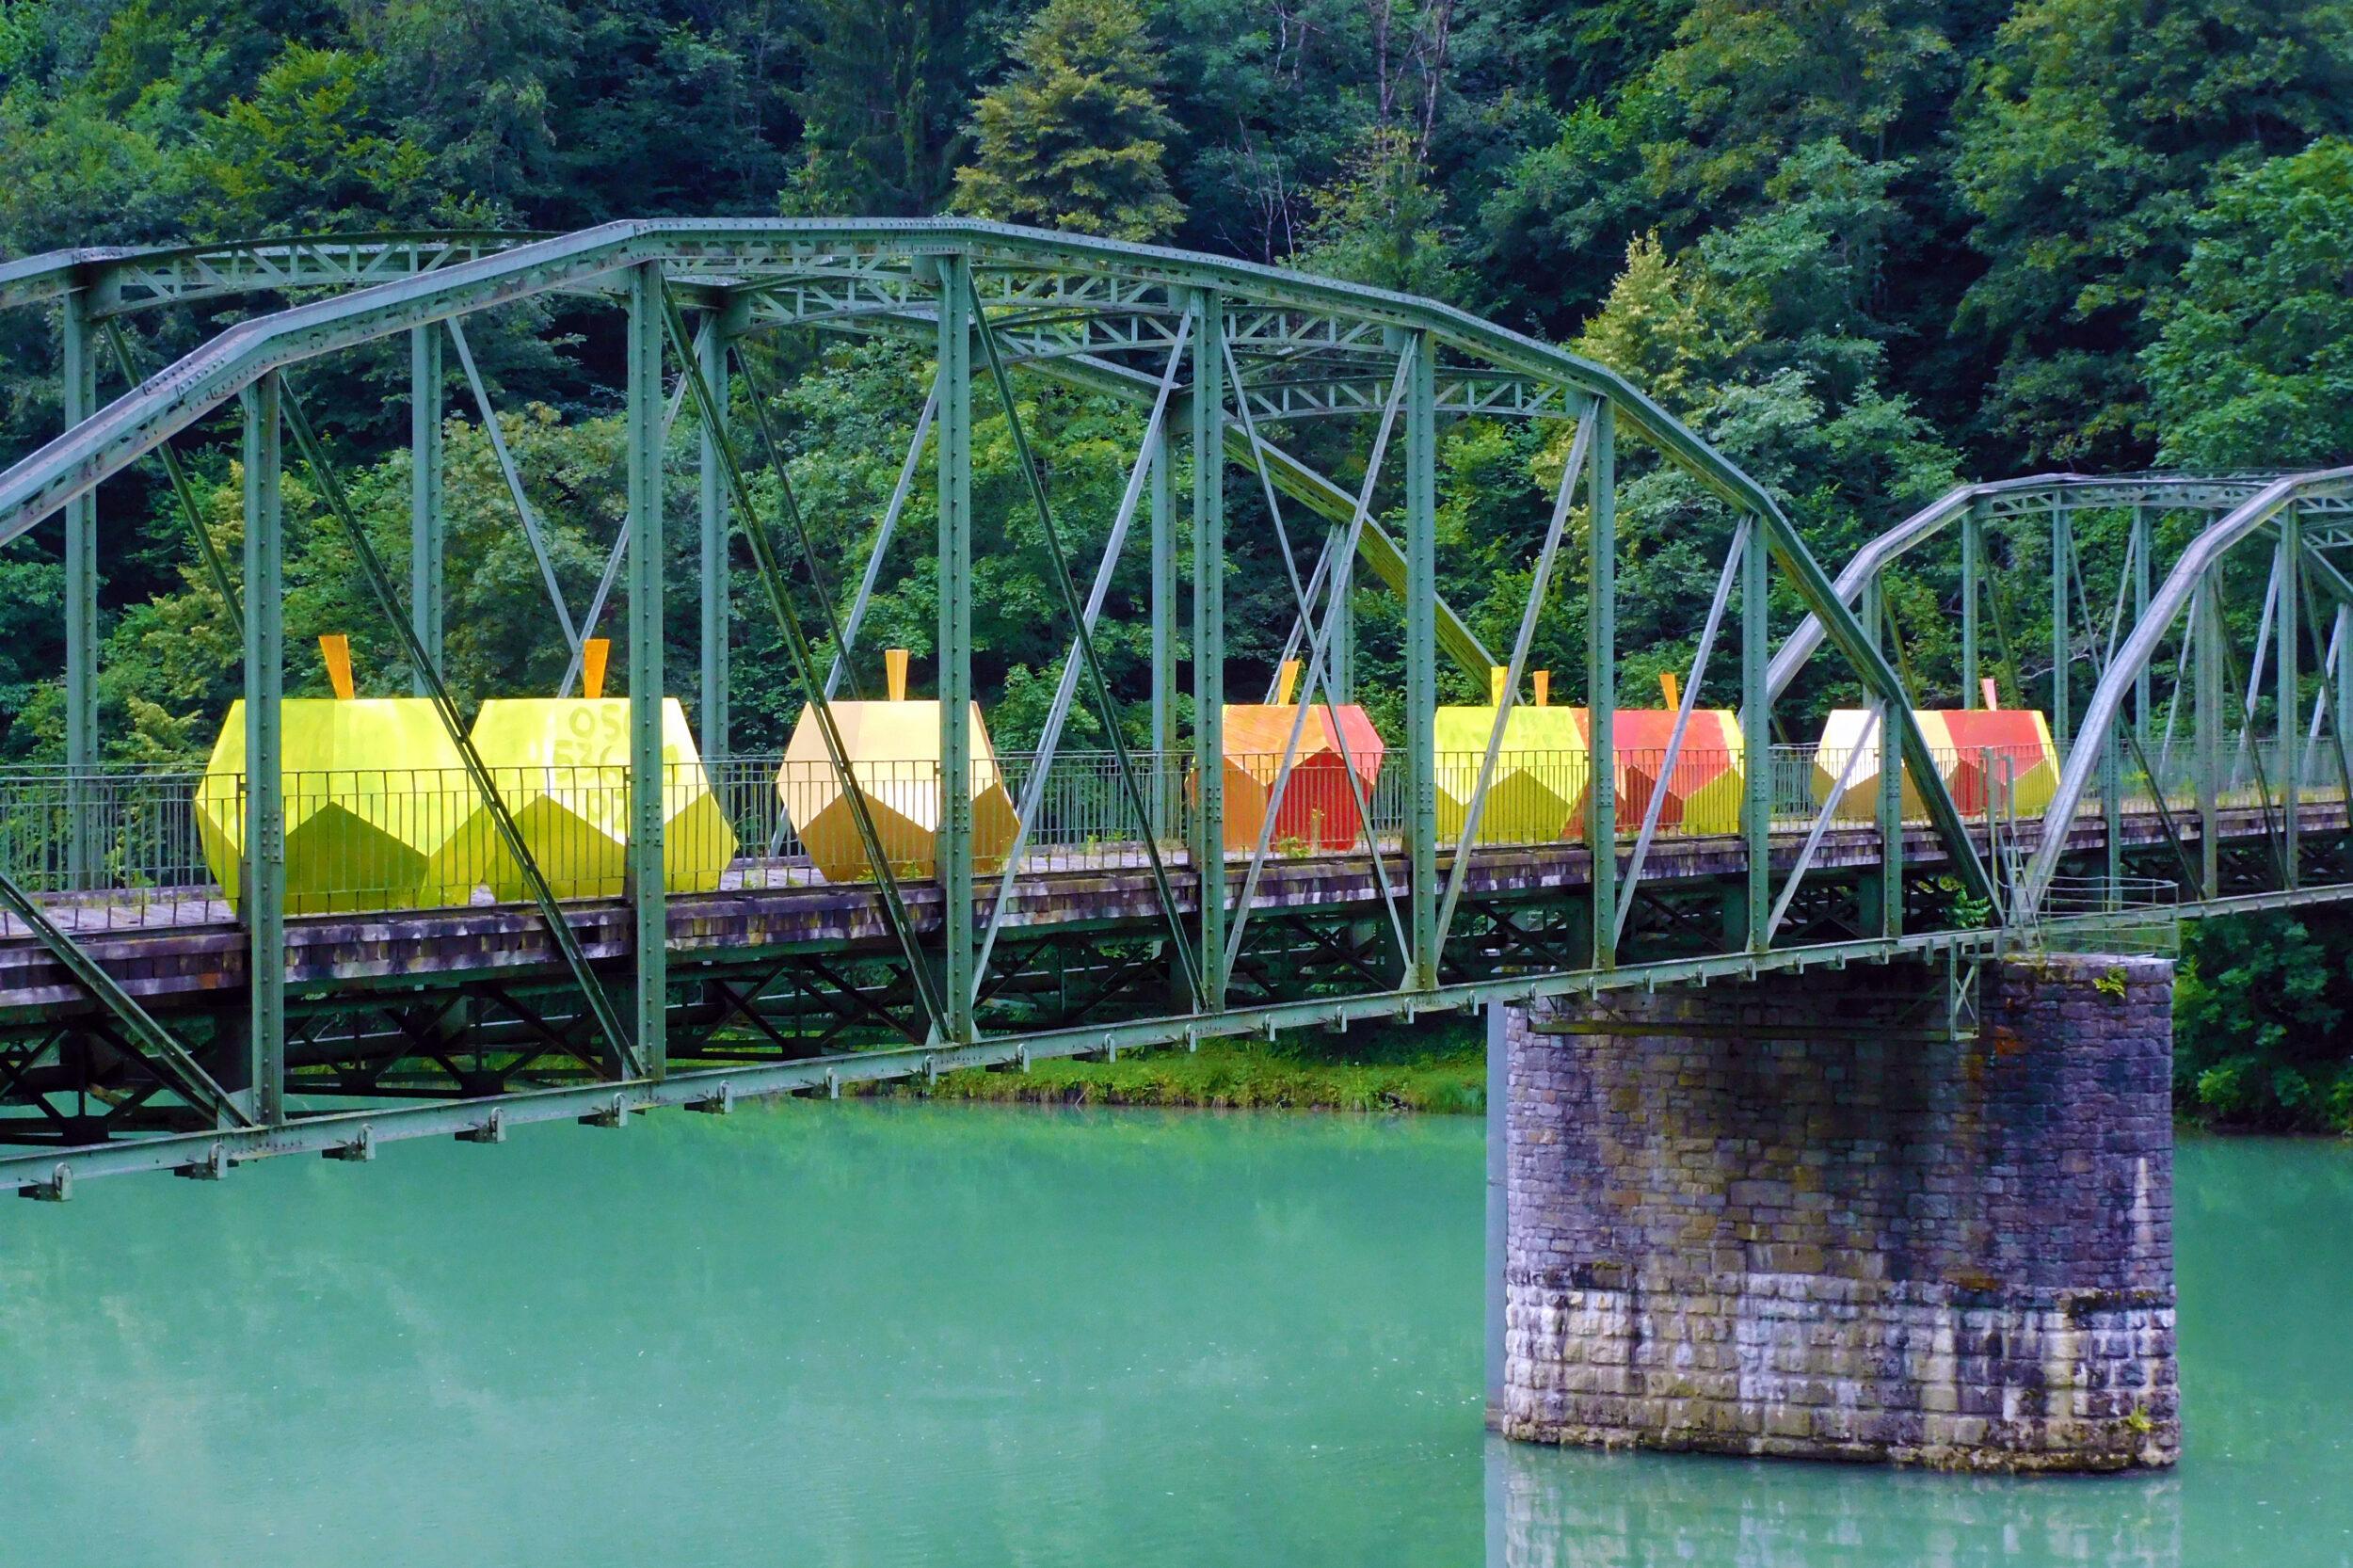 Samyi, Brücken bauen – Gradimo Mostove, 2020, Foto: Gerhard Leeb